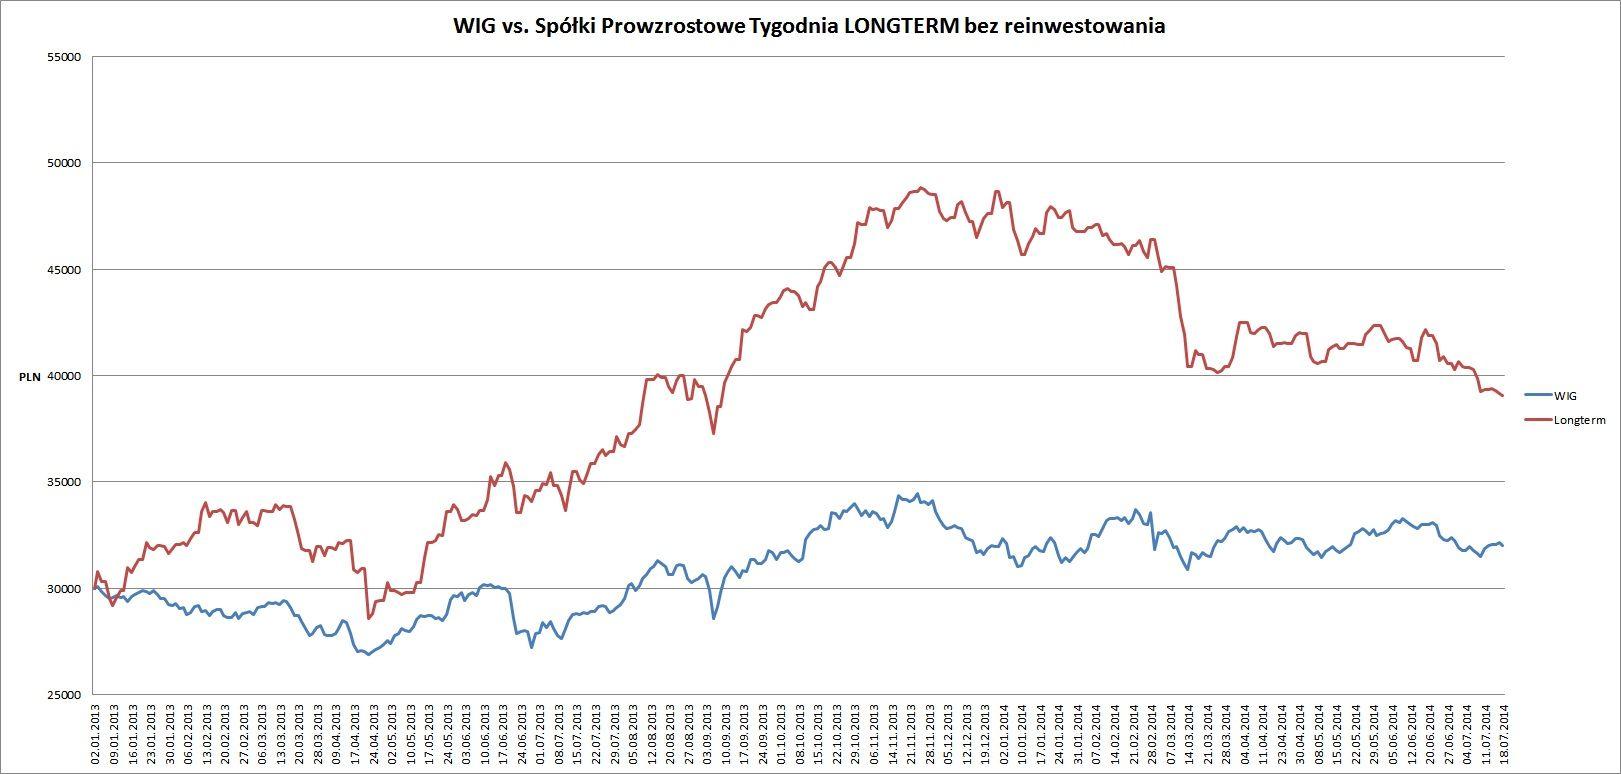 wig vs longterm od pocz. 2013